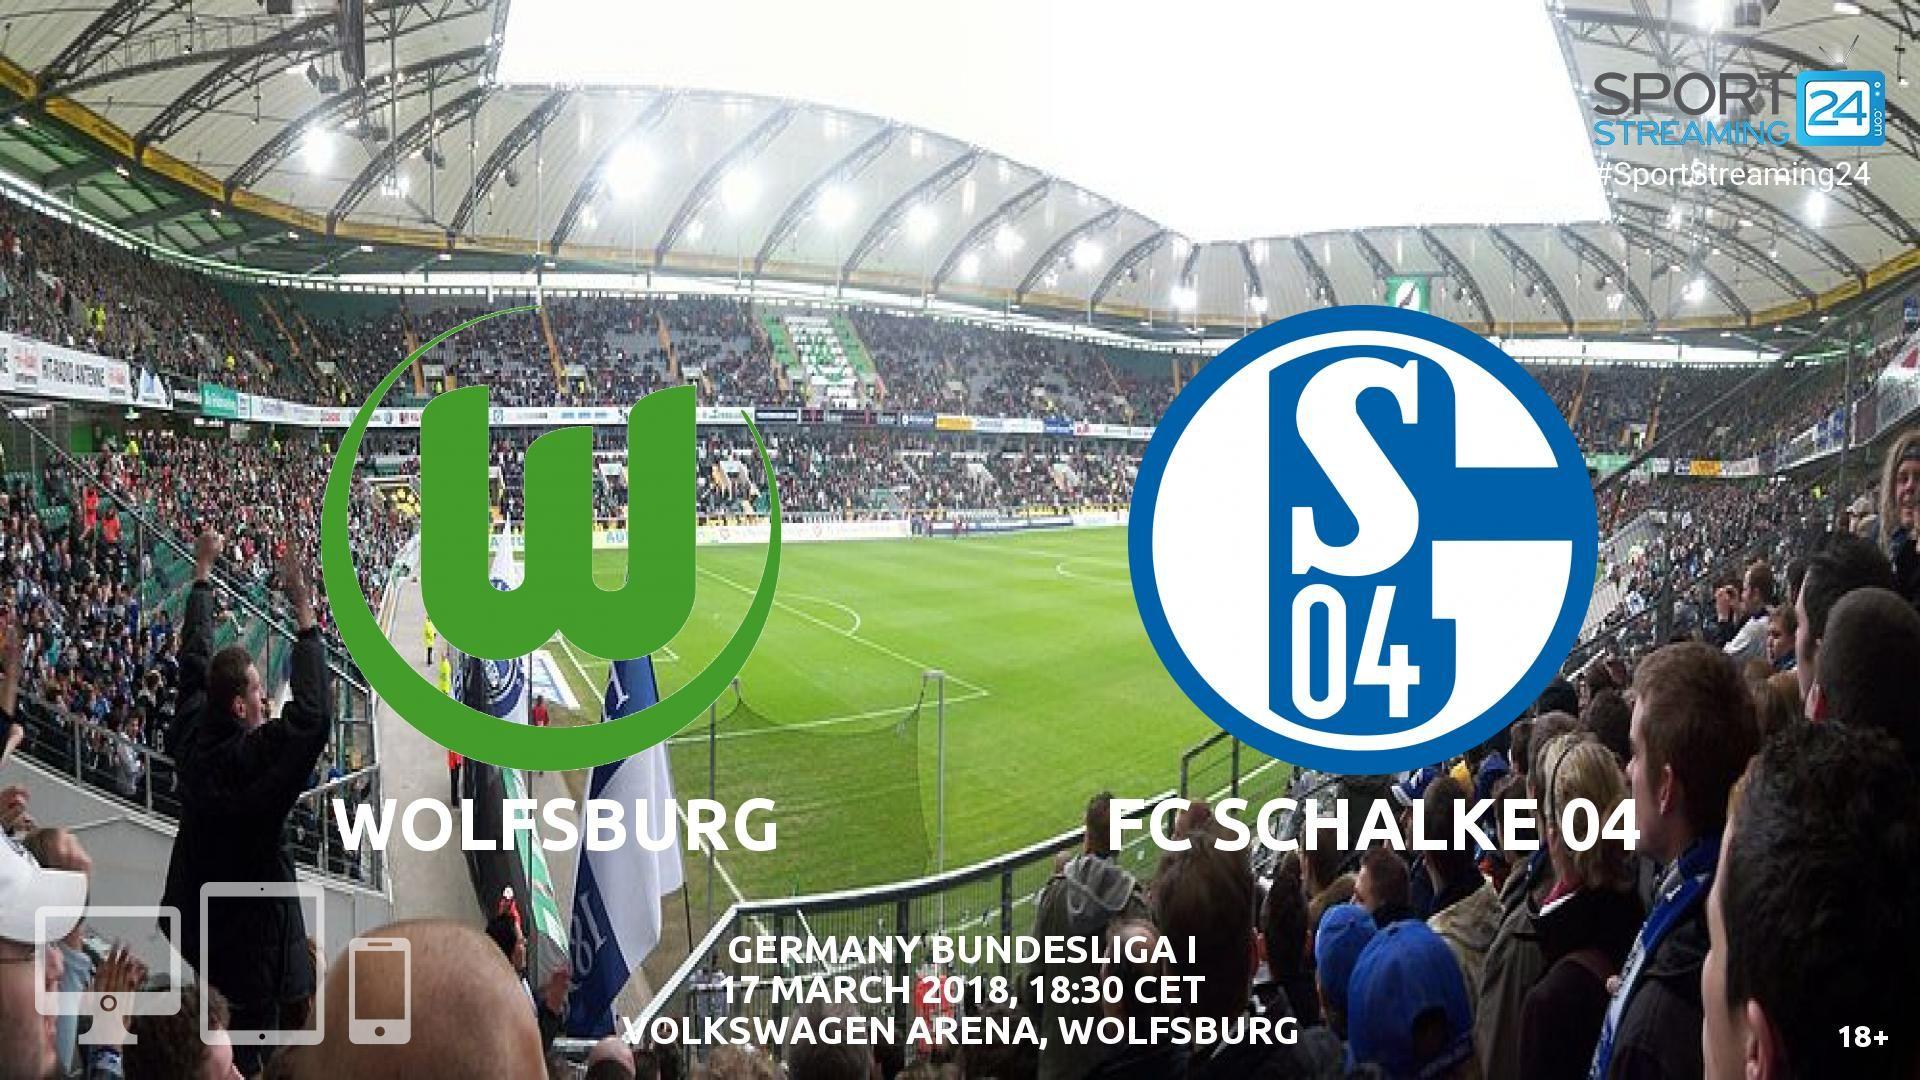 Wolfsburg V Schalke Live Streaming Football Wolfsburg Live Streaming Vfl Wolfsburg